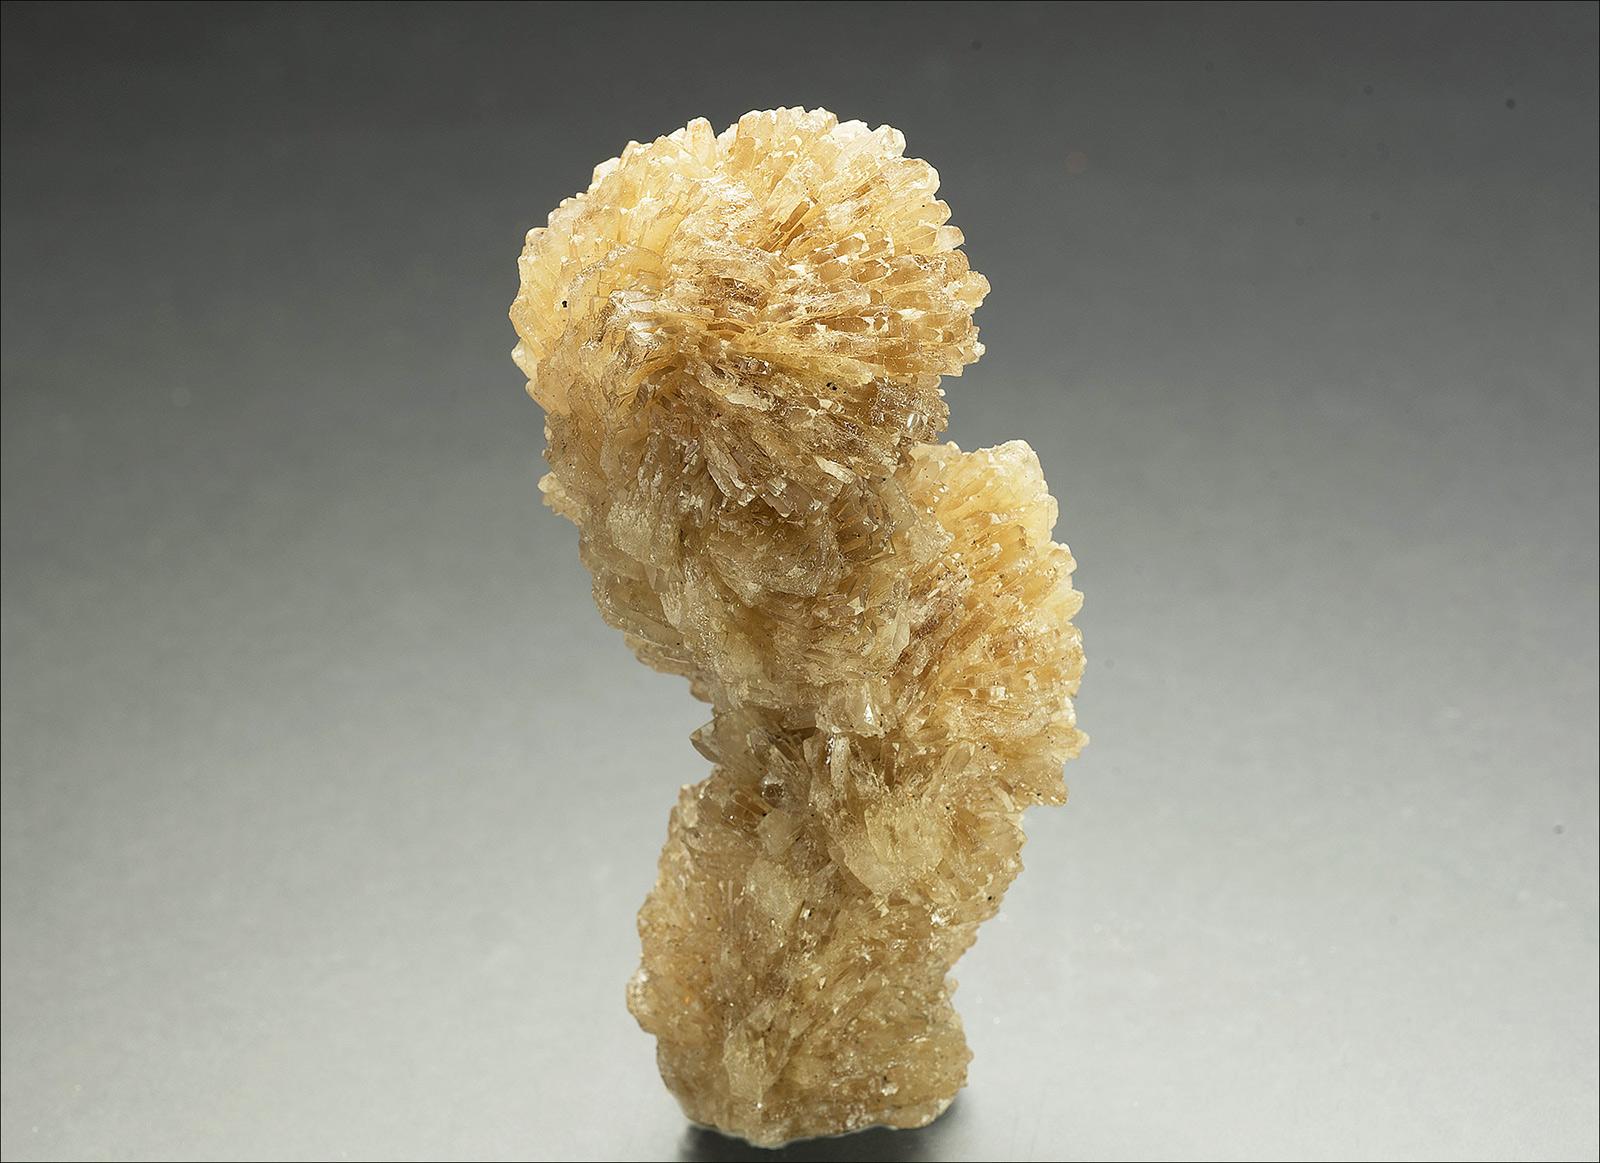 Barite stalagmite, Tanner Rake, Arkengarthdale.  35x30x80mm